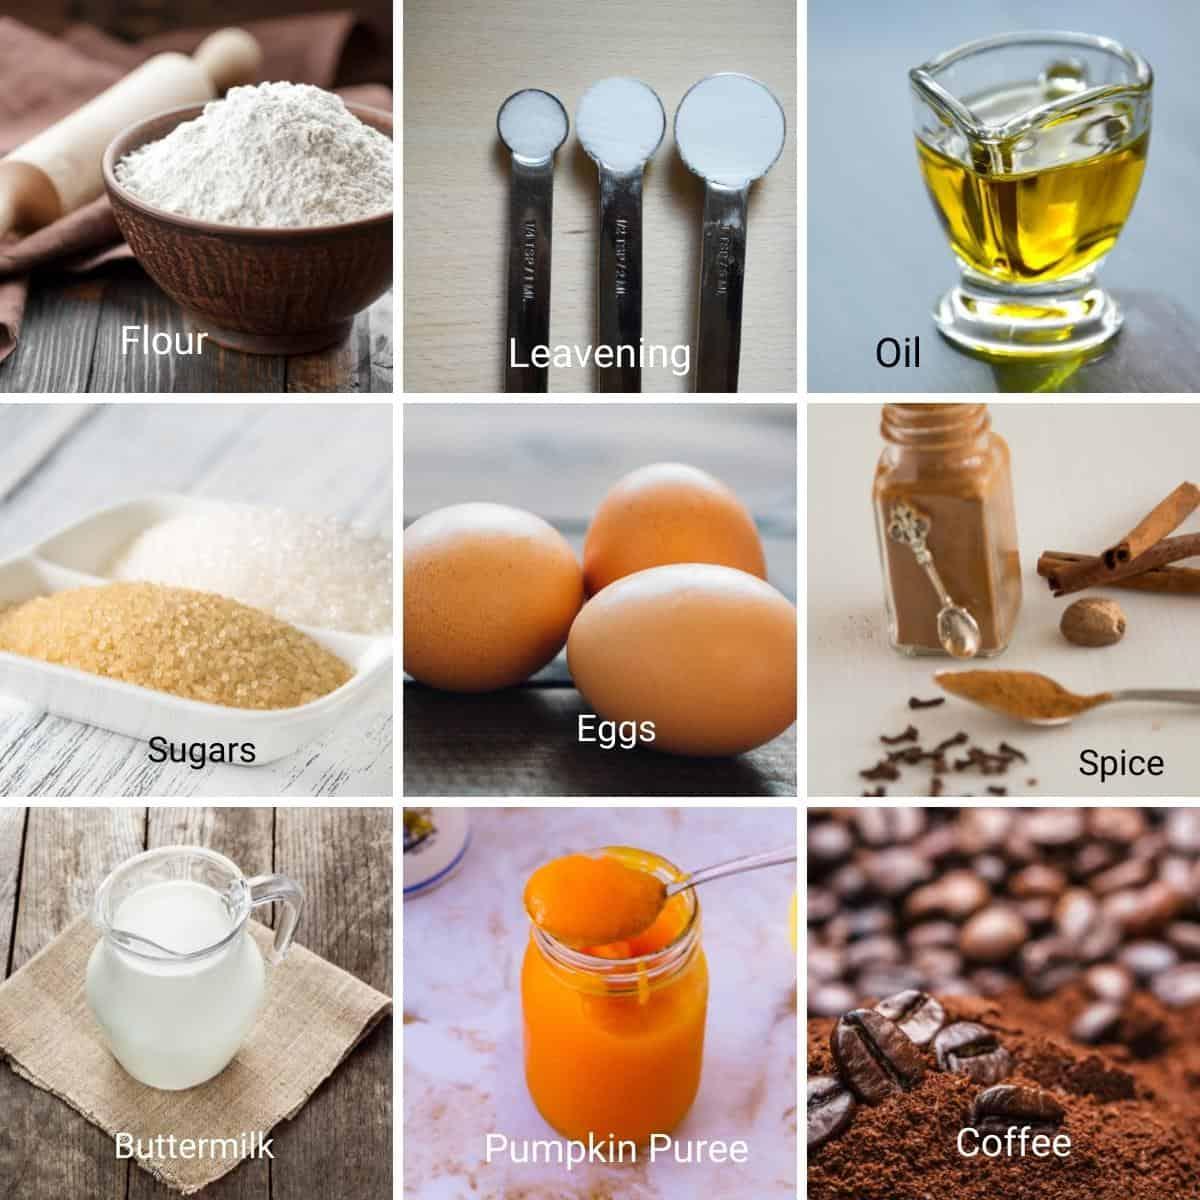 Ingredients for pumpkin spice latte cake.